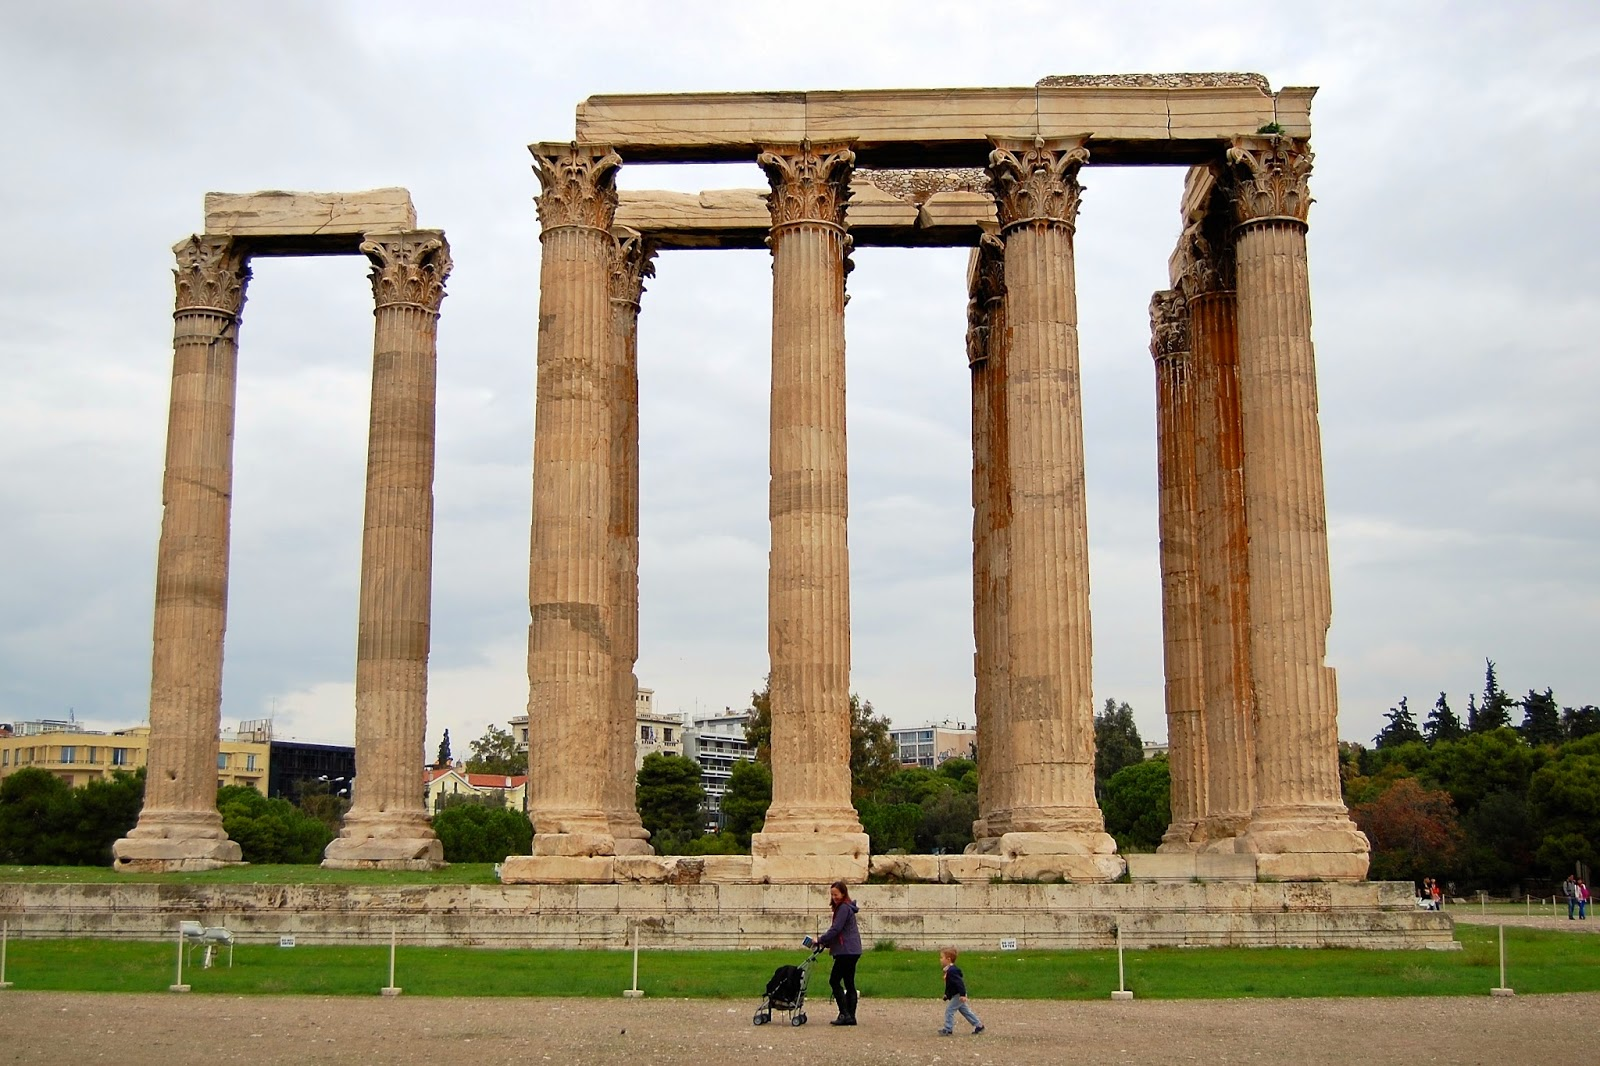 Temple columns are 56 feet high